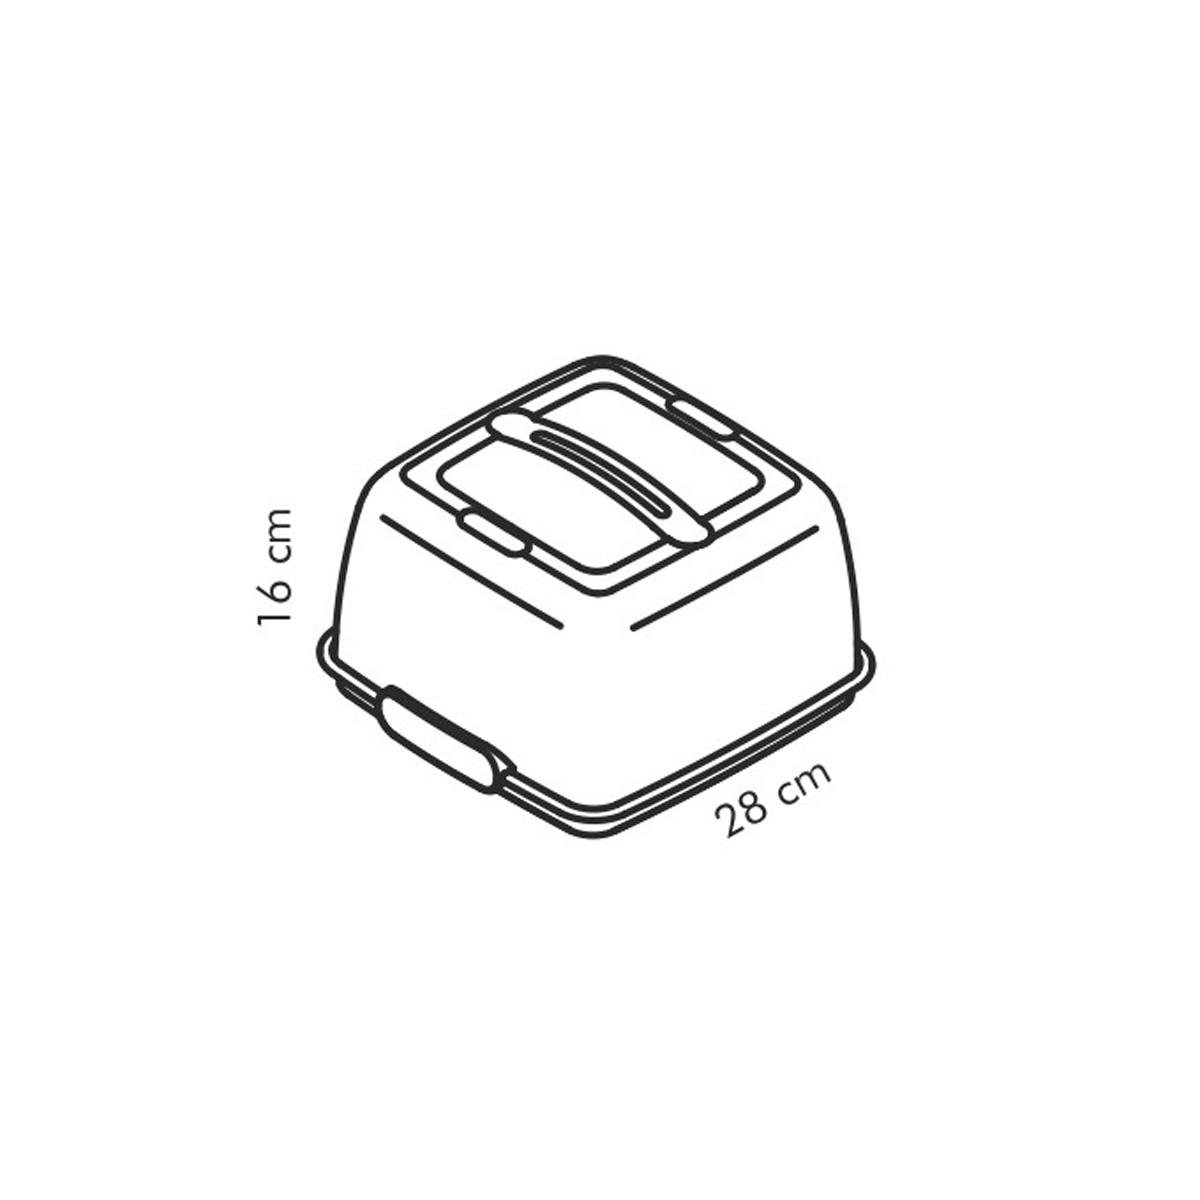 Chladicí podnos s poklopem DELÍCIA 28x28 cm